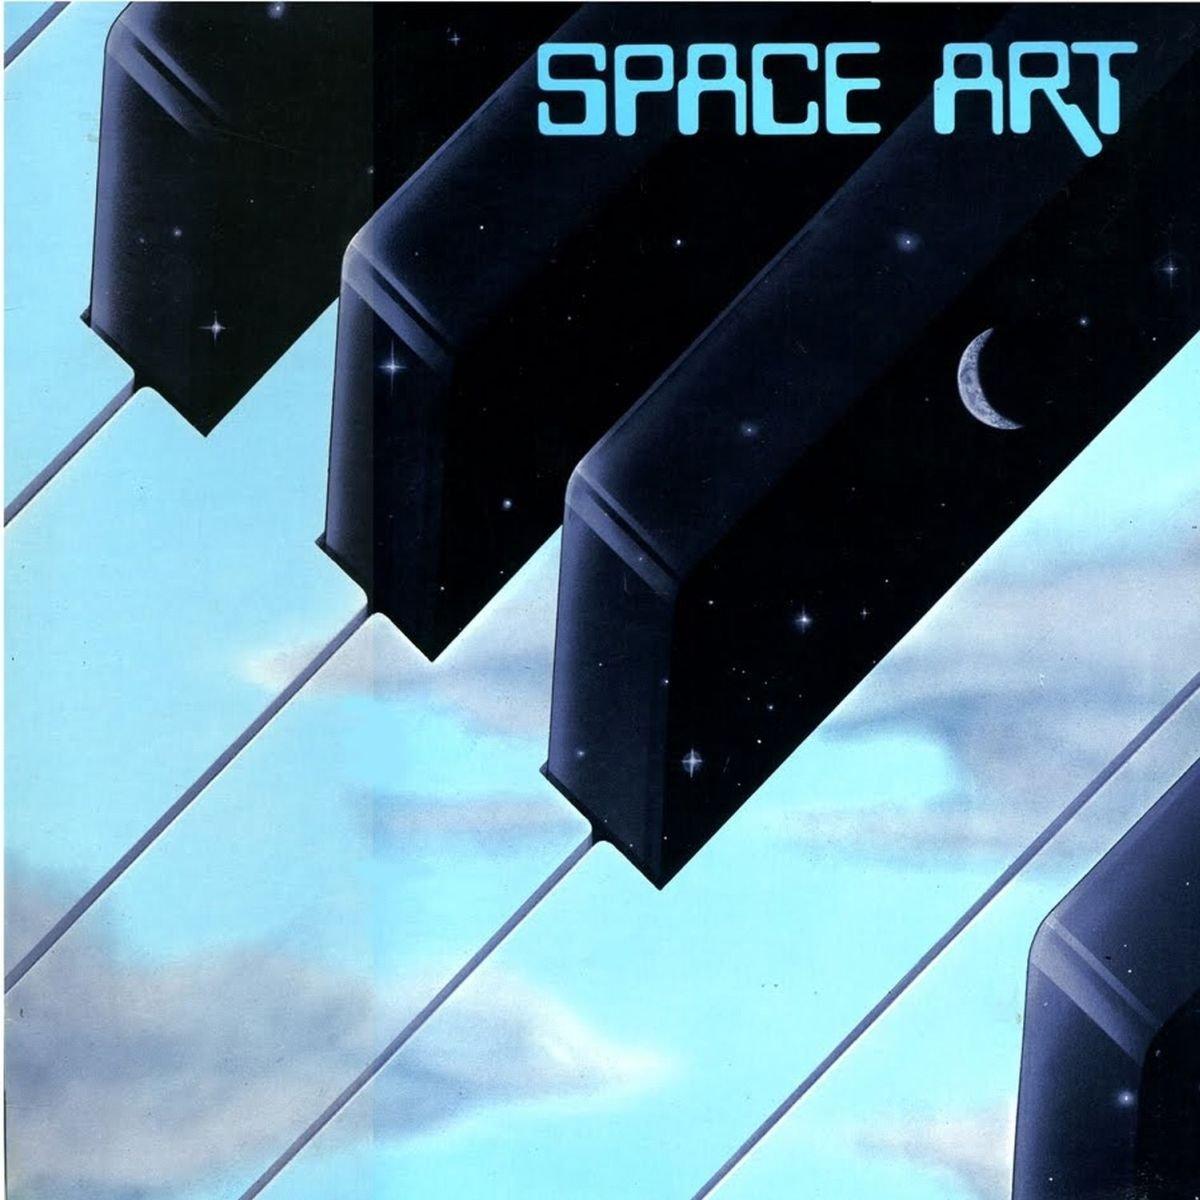 SPACE ART - SPACE ART (W/CD)